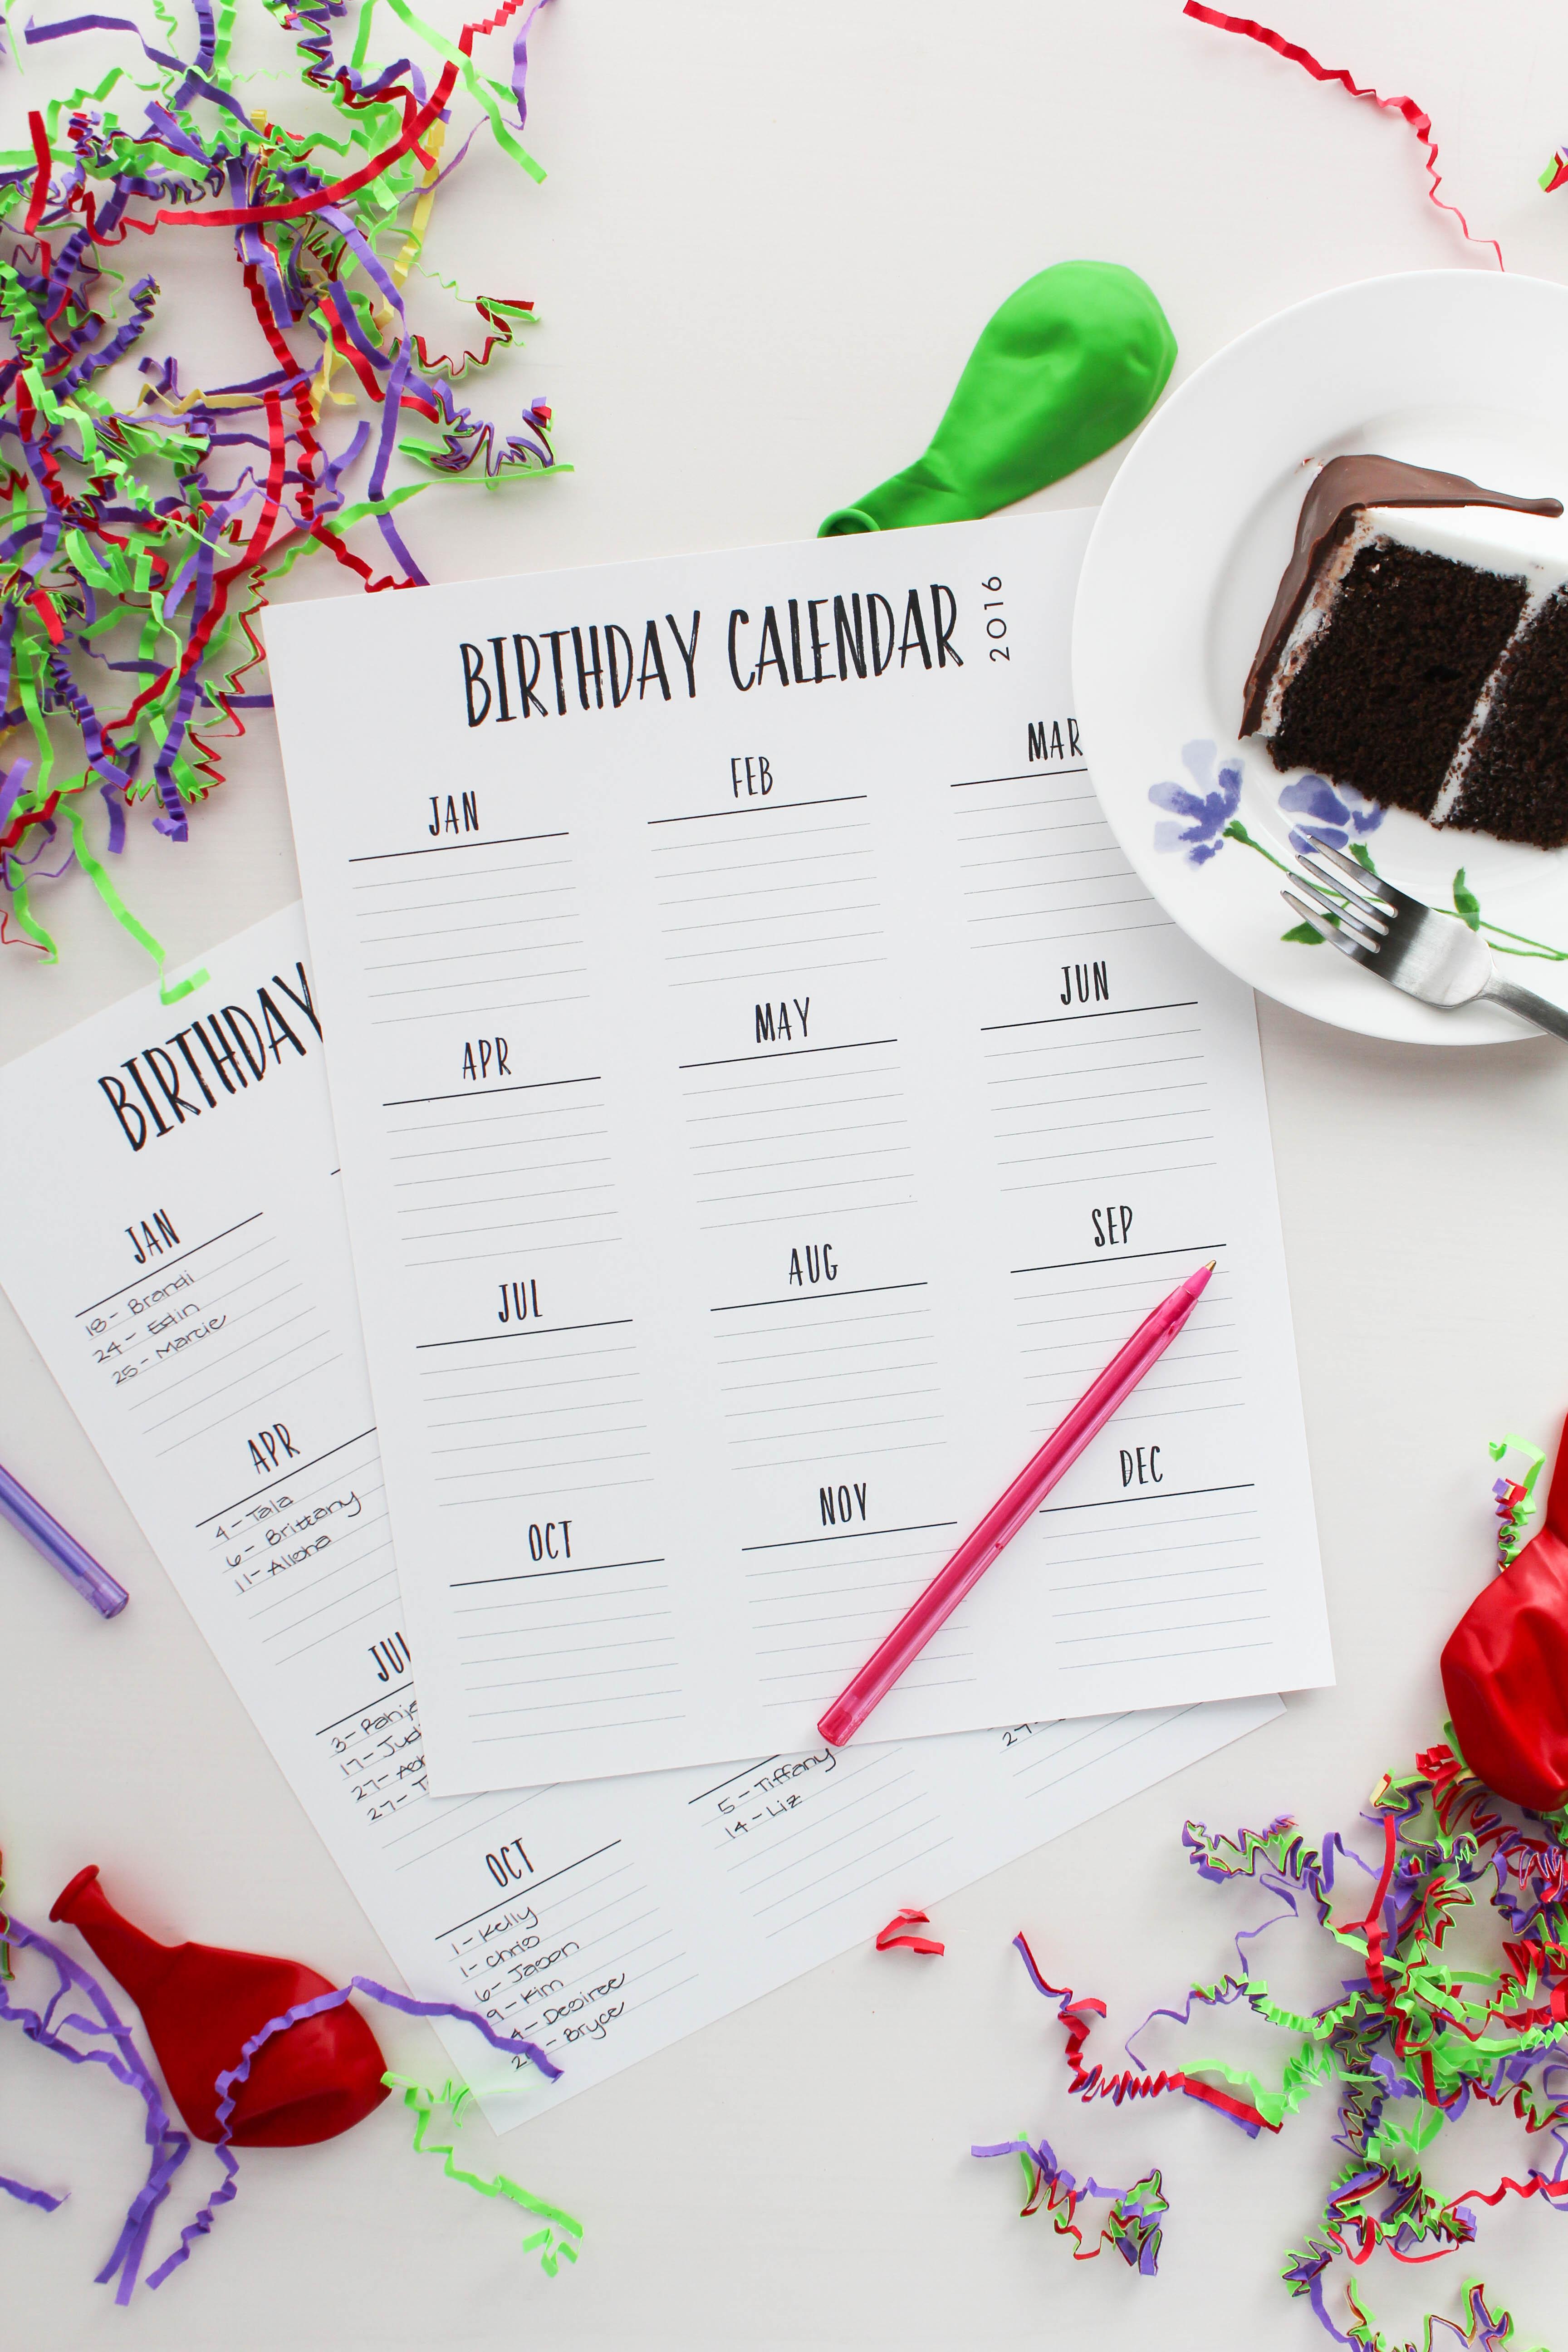 Birthday Calendars : Birthday calendar printable let s mingle